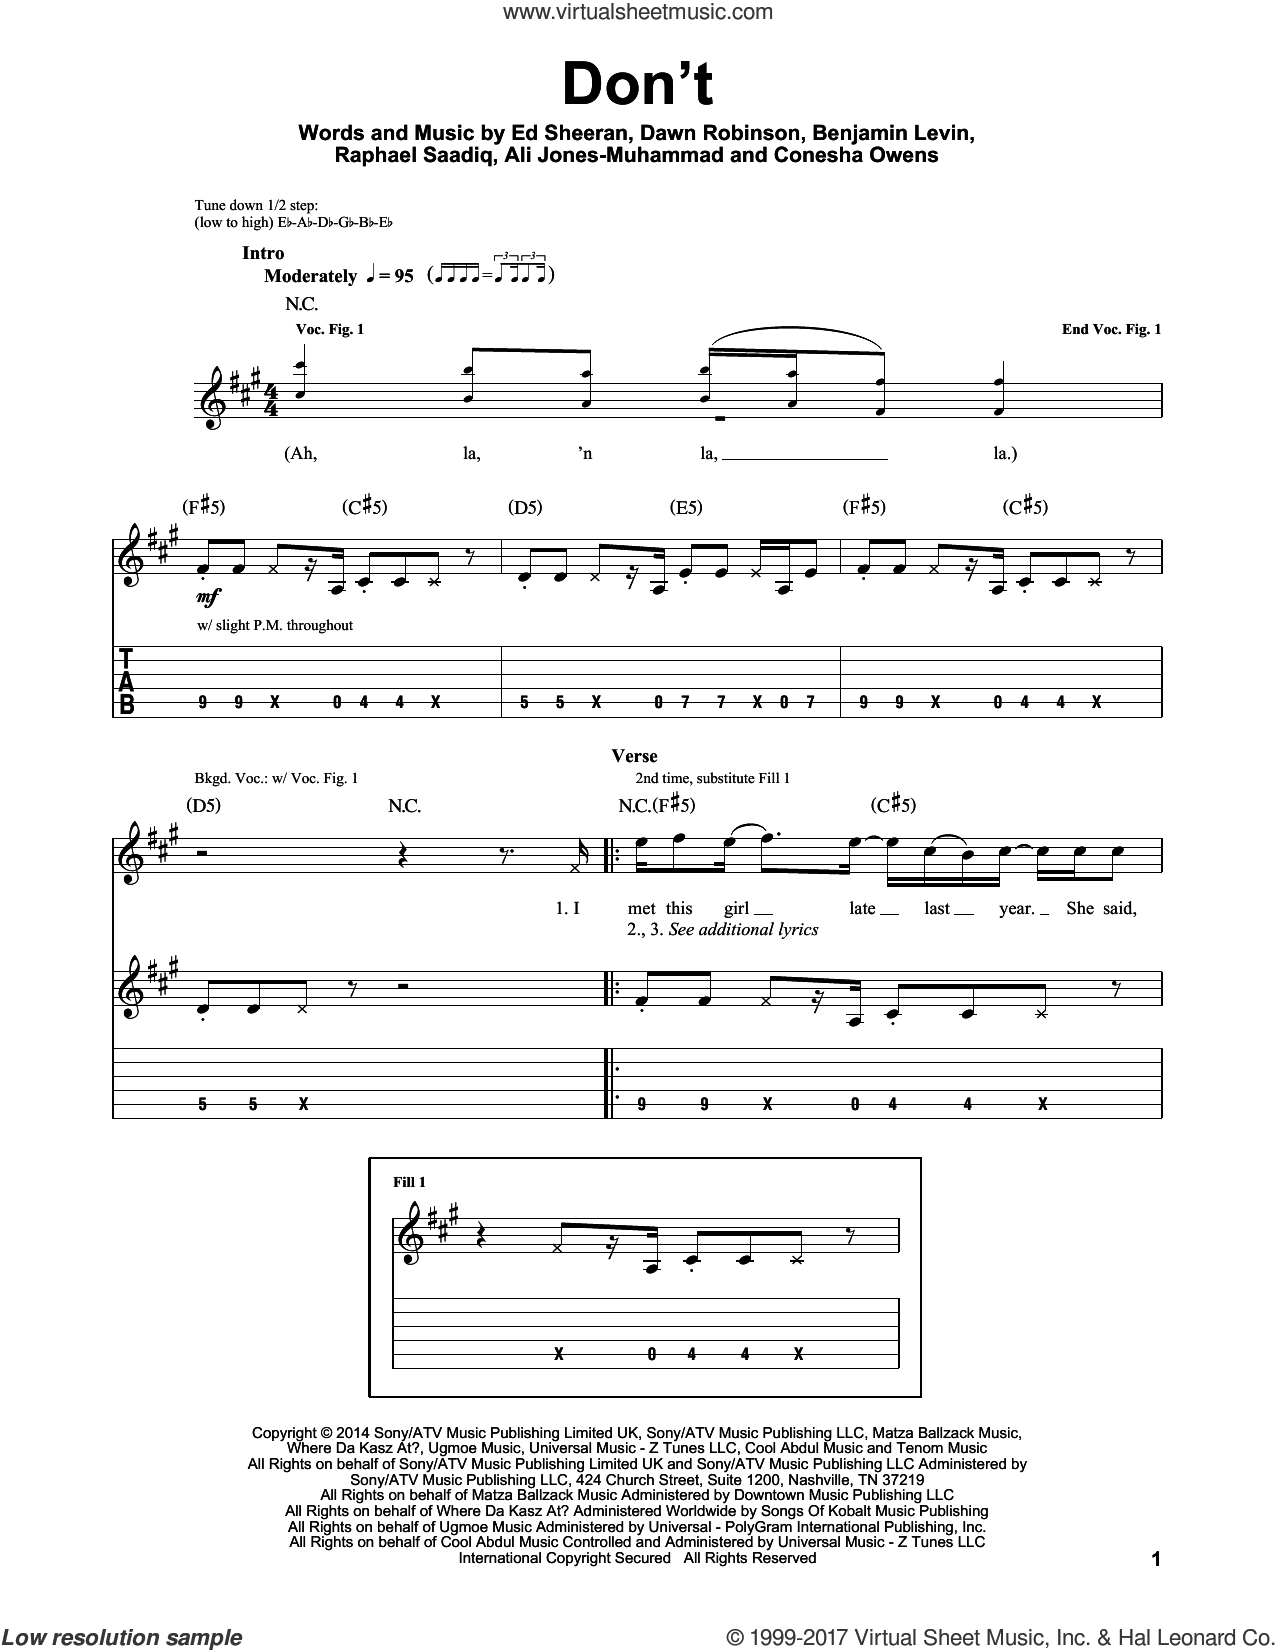 Don't sheet music for guitar (tablature, play-along) by Ed Sheeran, Ali Jones-Muhammad, Benjamin Levin, Conesha Owens, Dawn Robinson and Raphael Saadiq, intermediate skill level